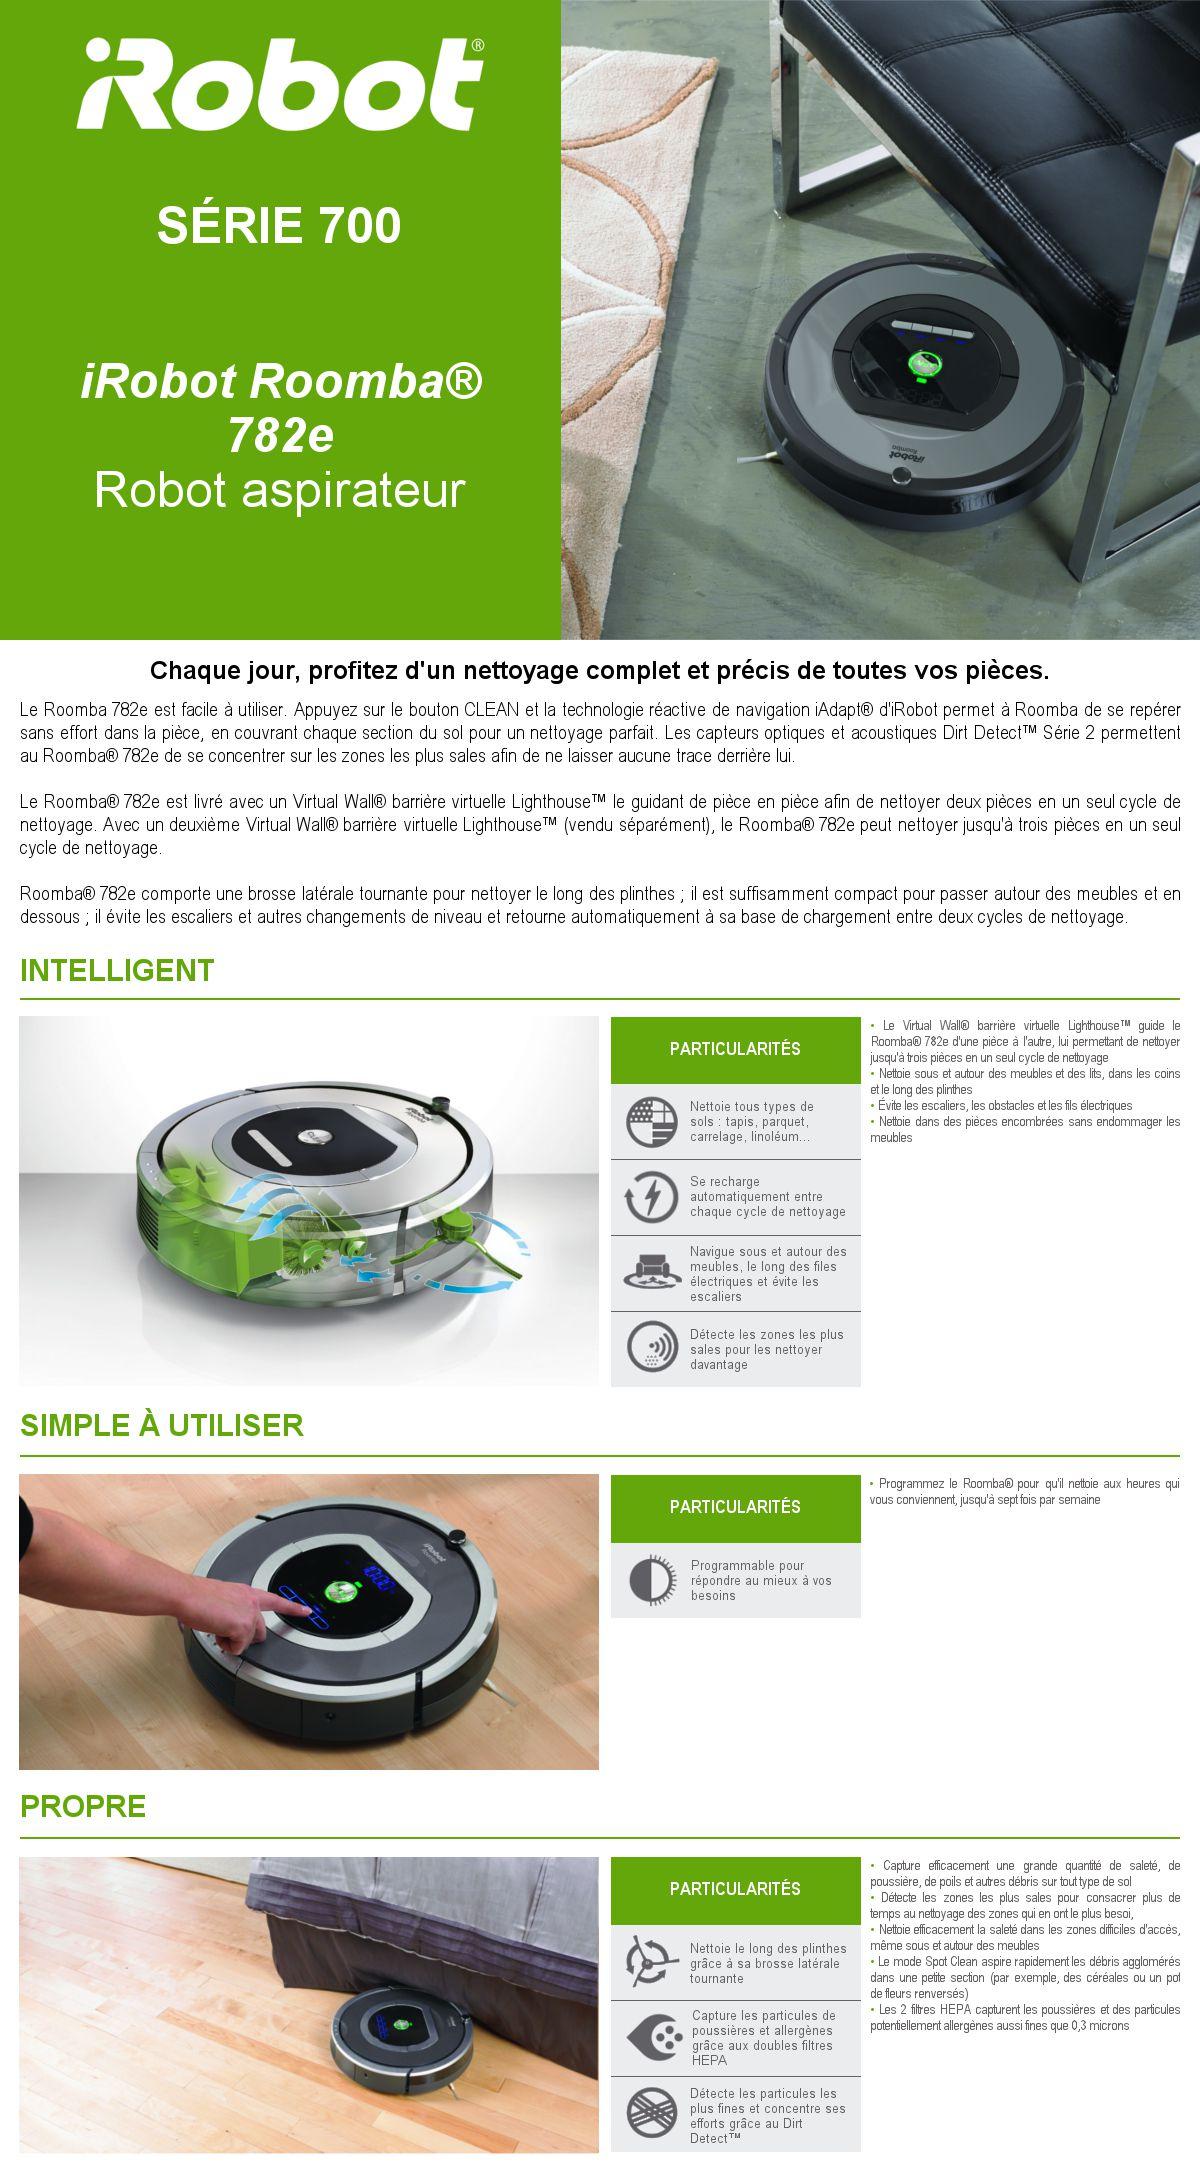 irobot roomba 782e aspirateur robot 33w 61 db gris. Black Bedroom Furniture Sets. Home Design Ideas